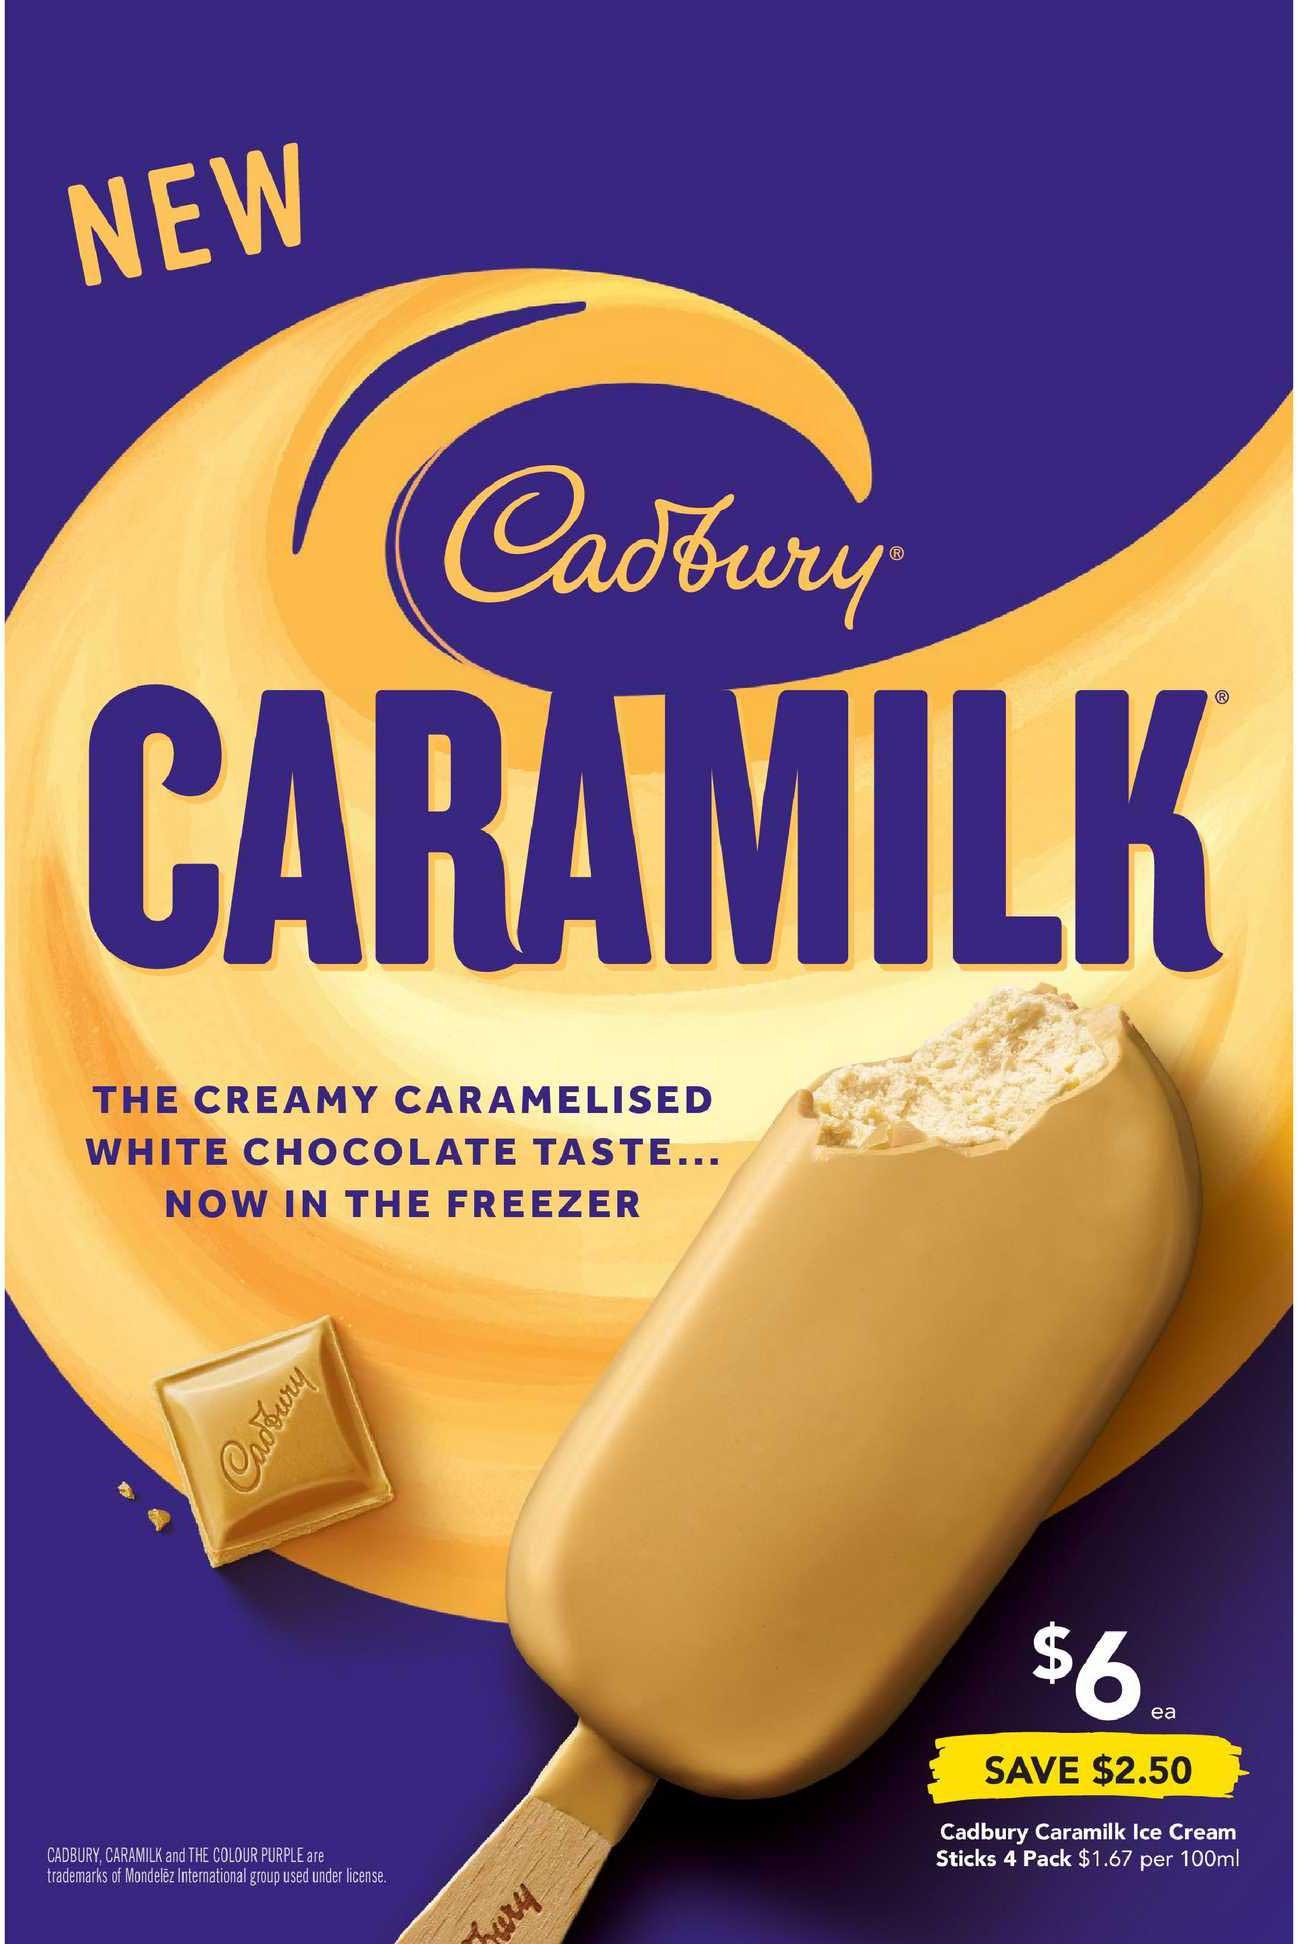 Drakes Cadbury Caramilk Ice Cream Sticks 4 Pack